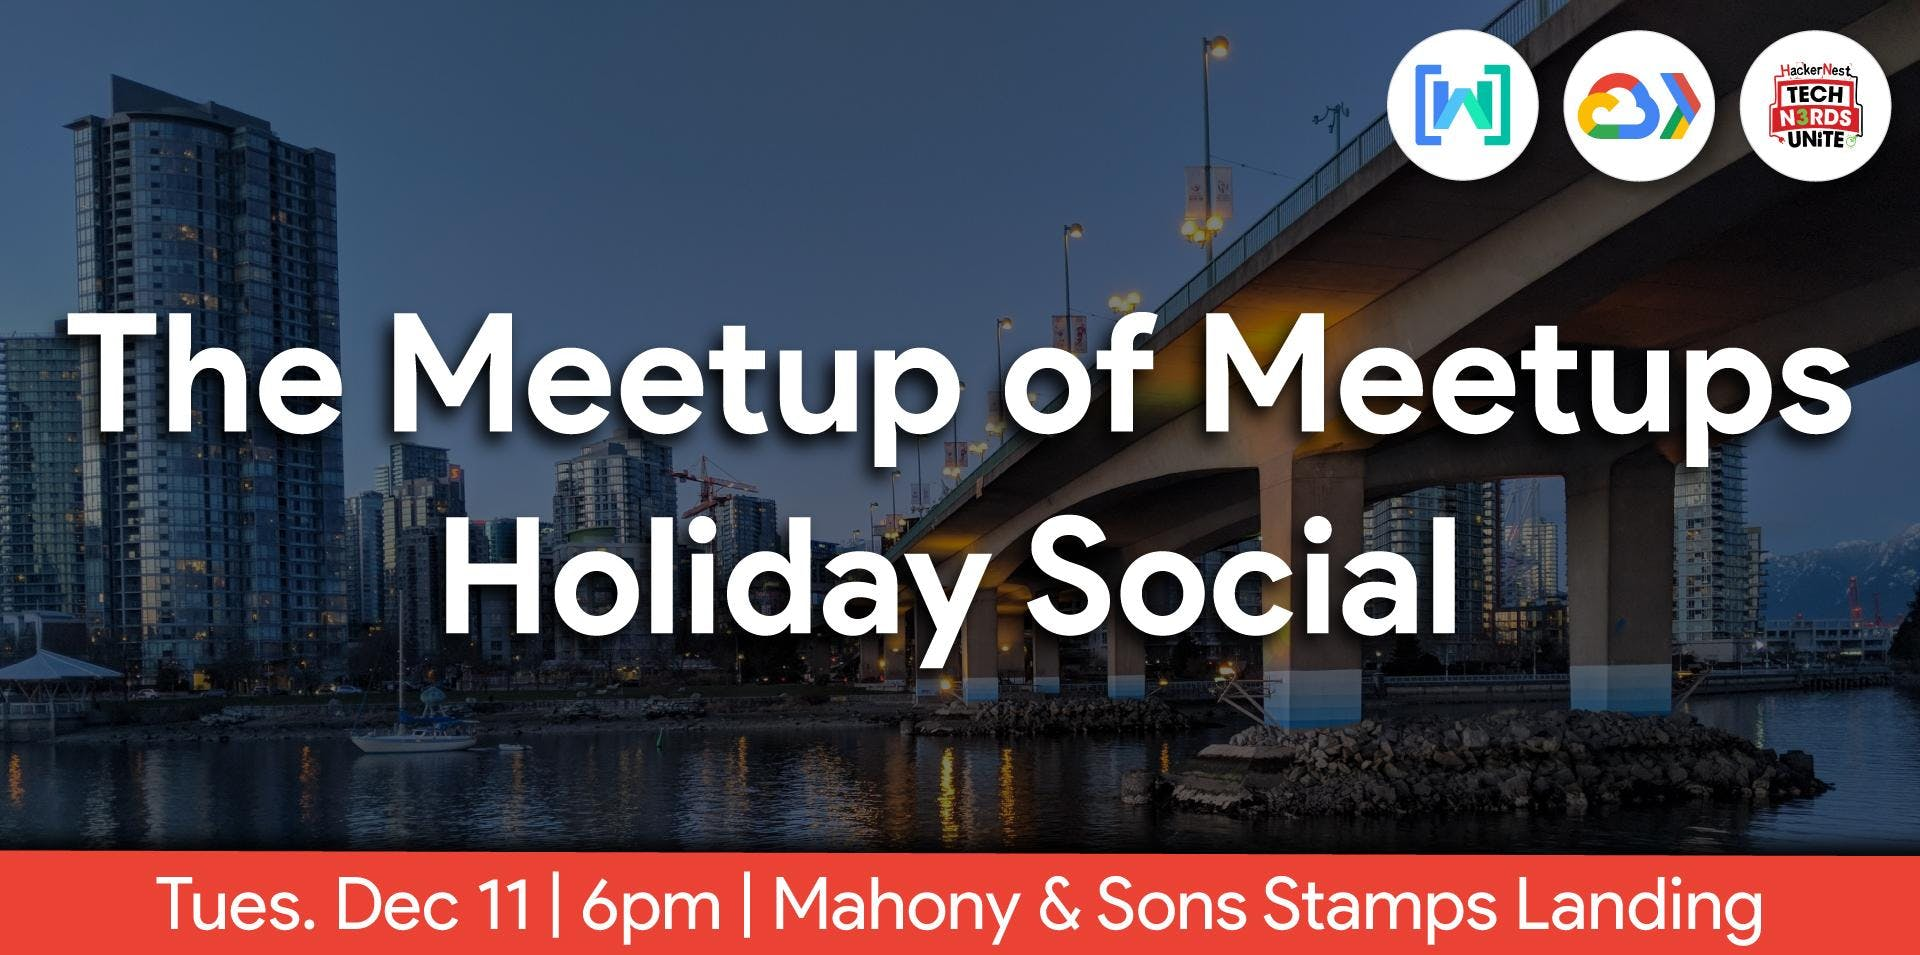 The Meetup of Meetups, Holiday Social